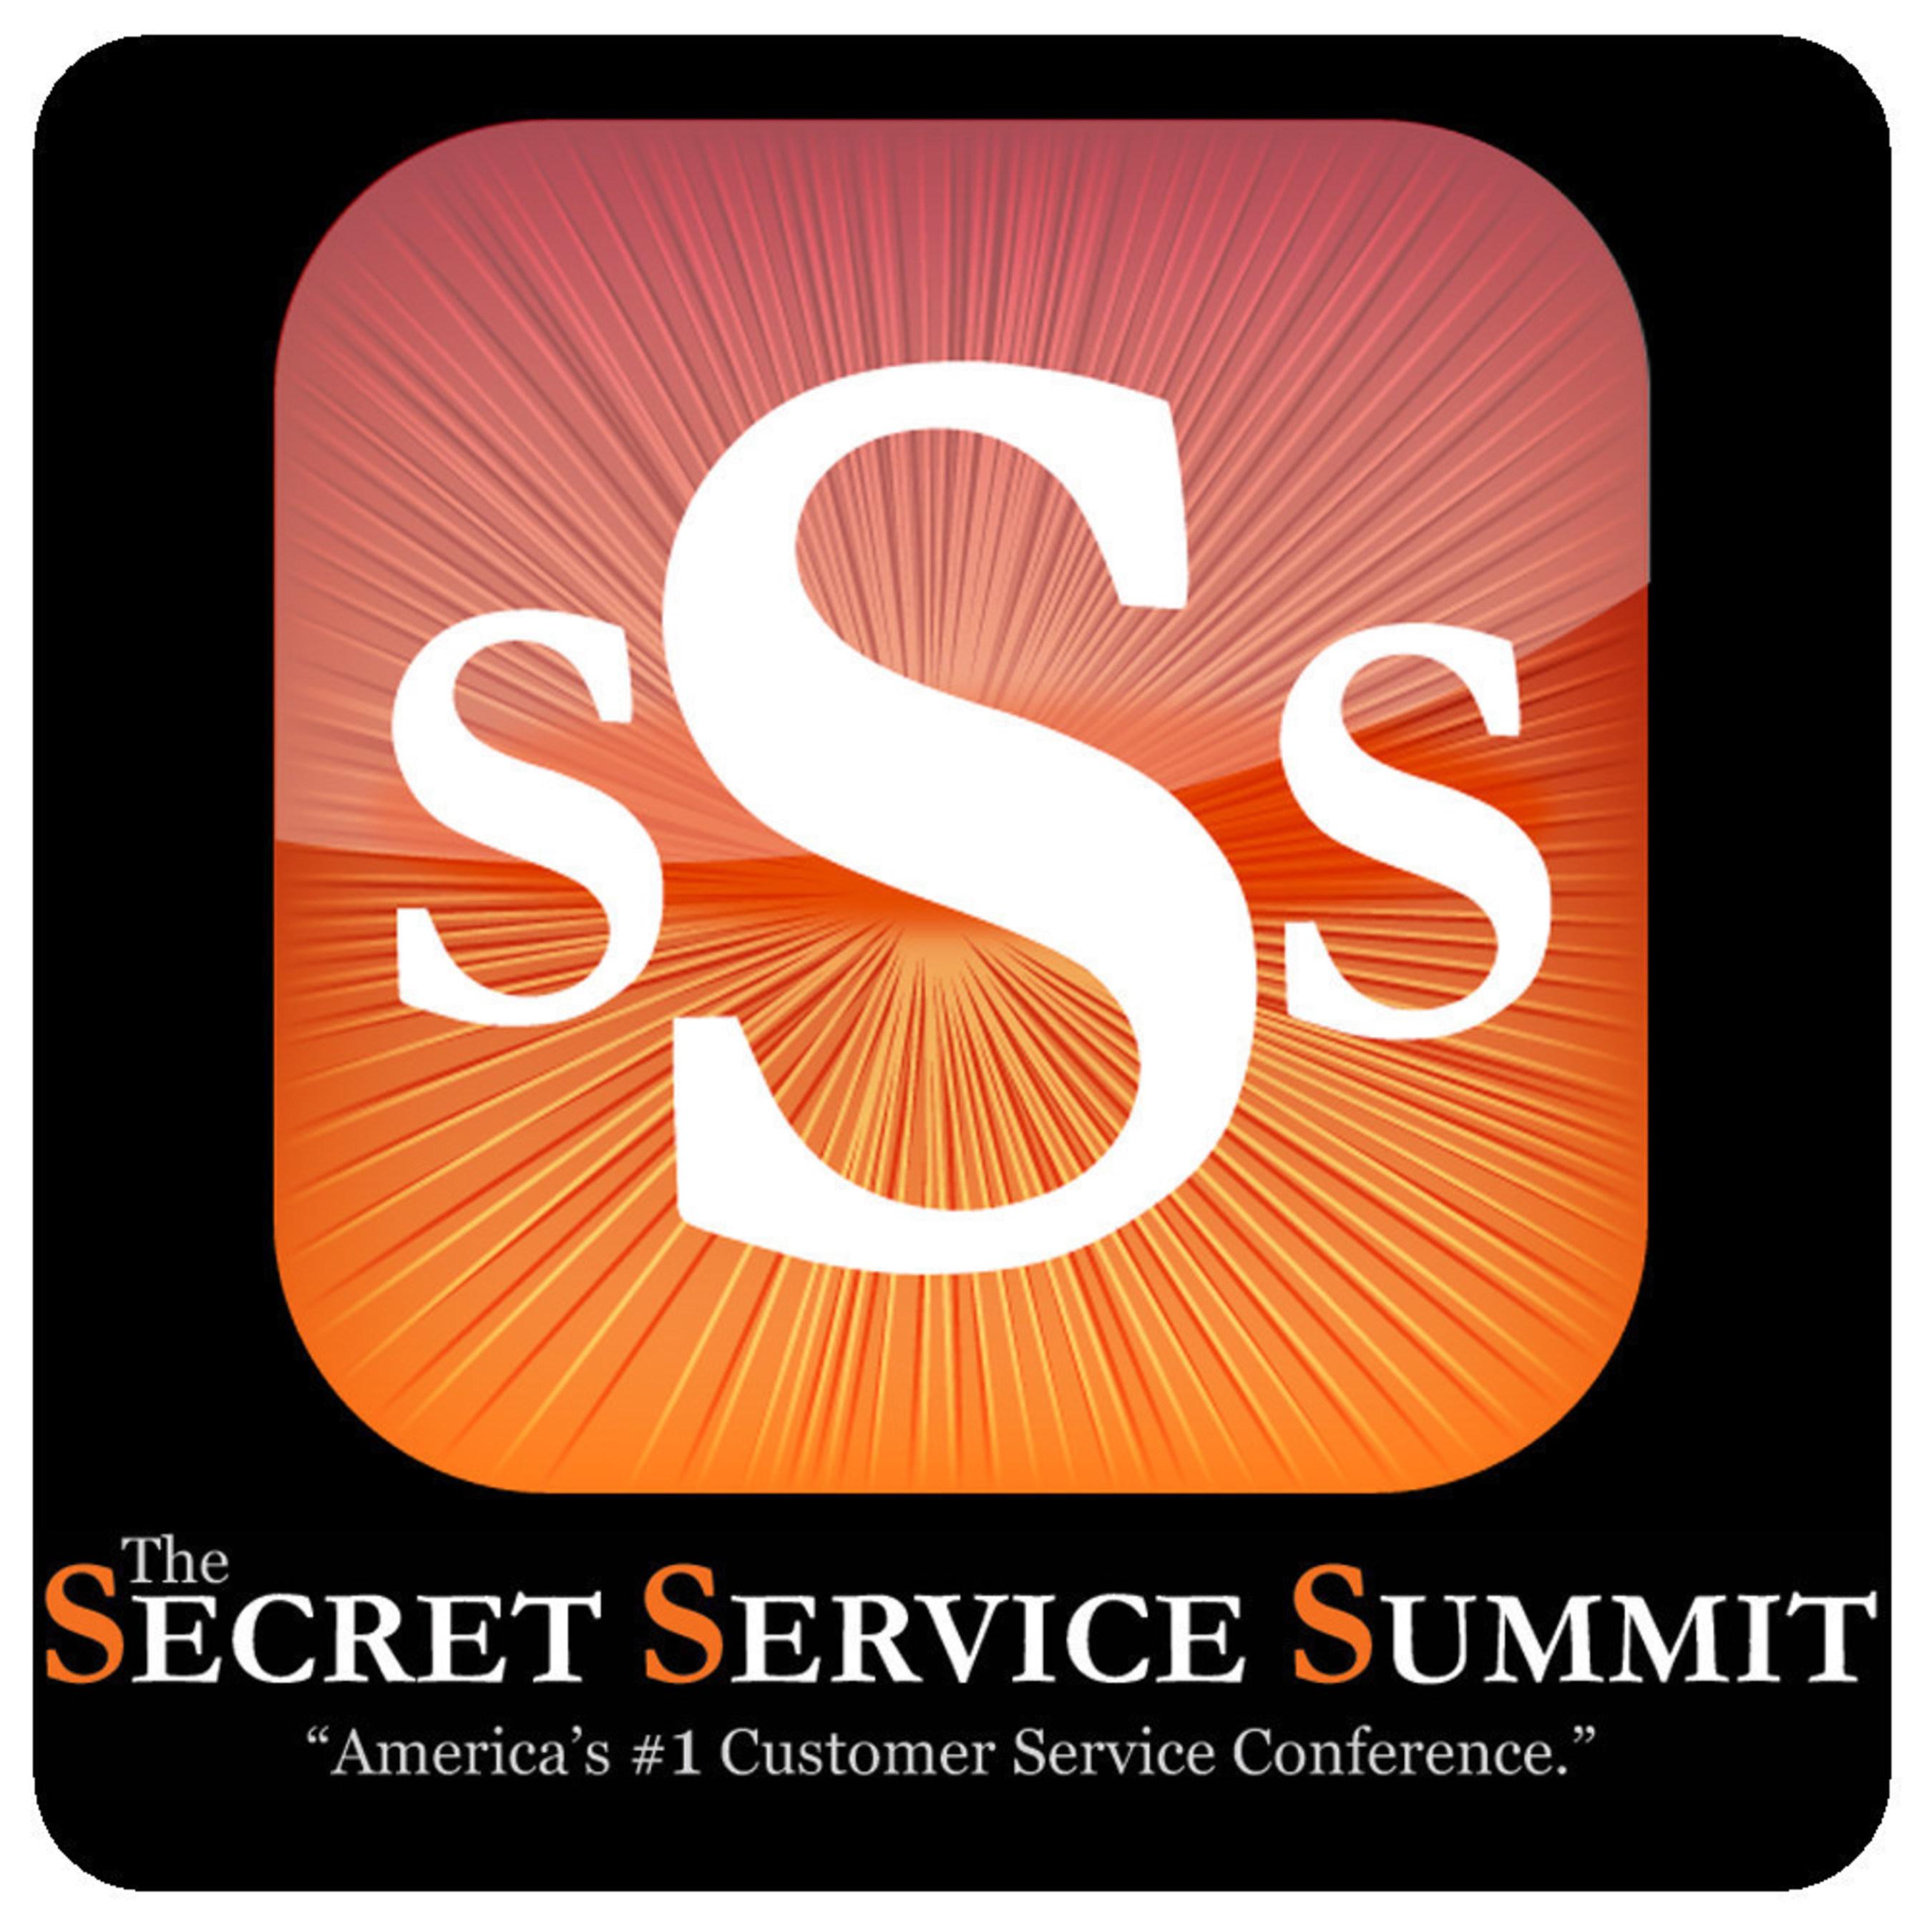 Learn more at secretservicesummit.com